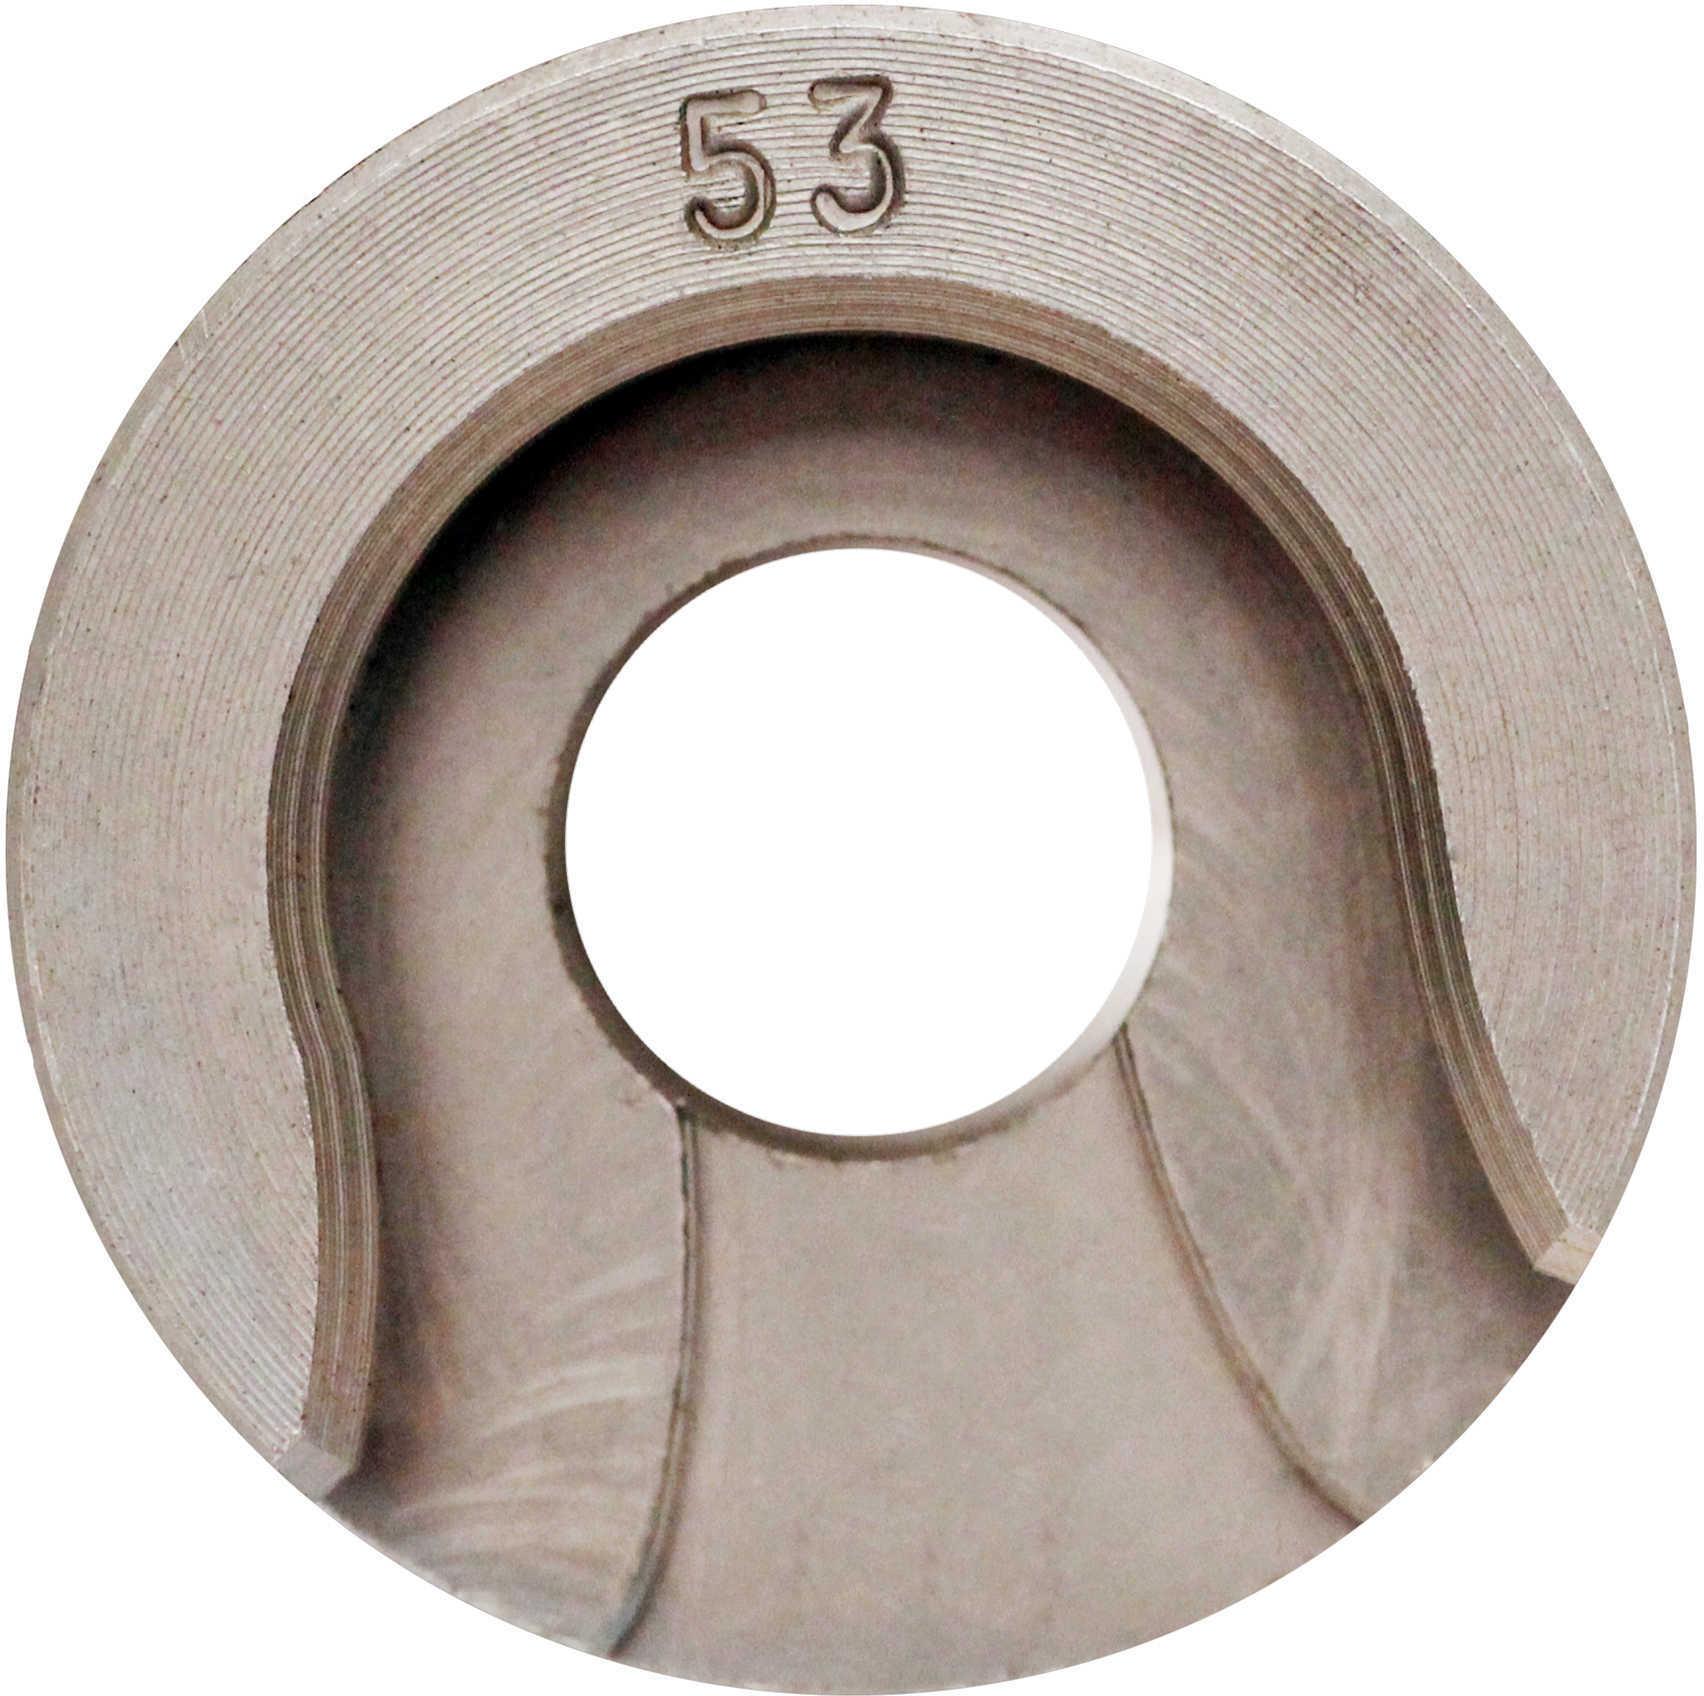 Hornady Shell Holder Size 30 Md: 390570